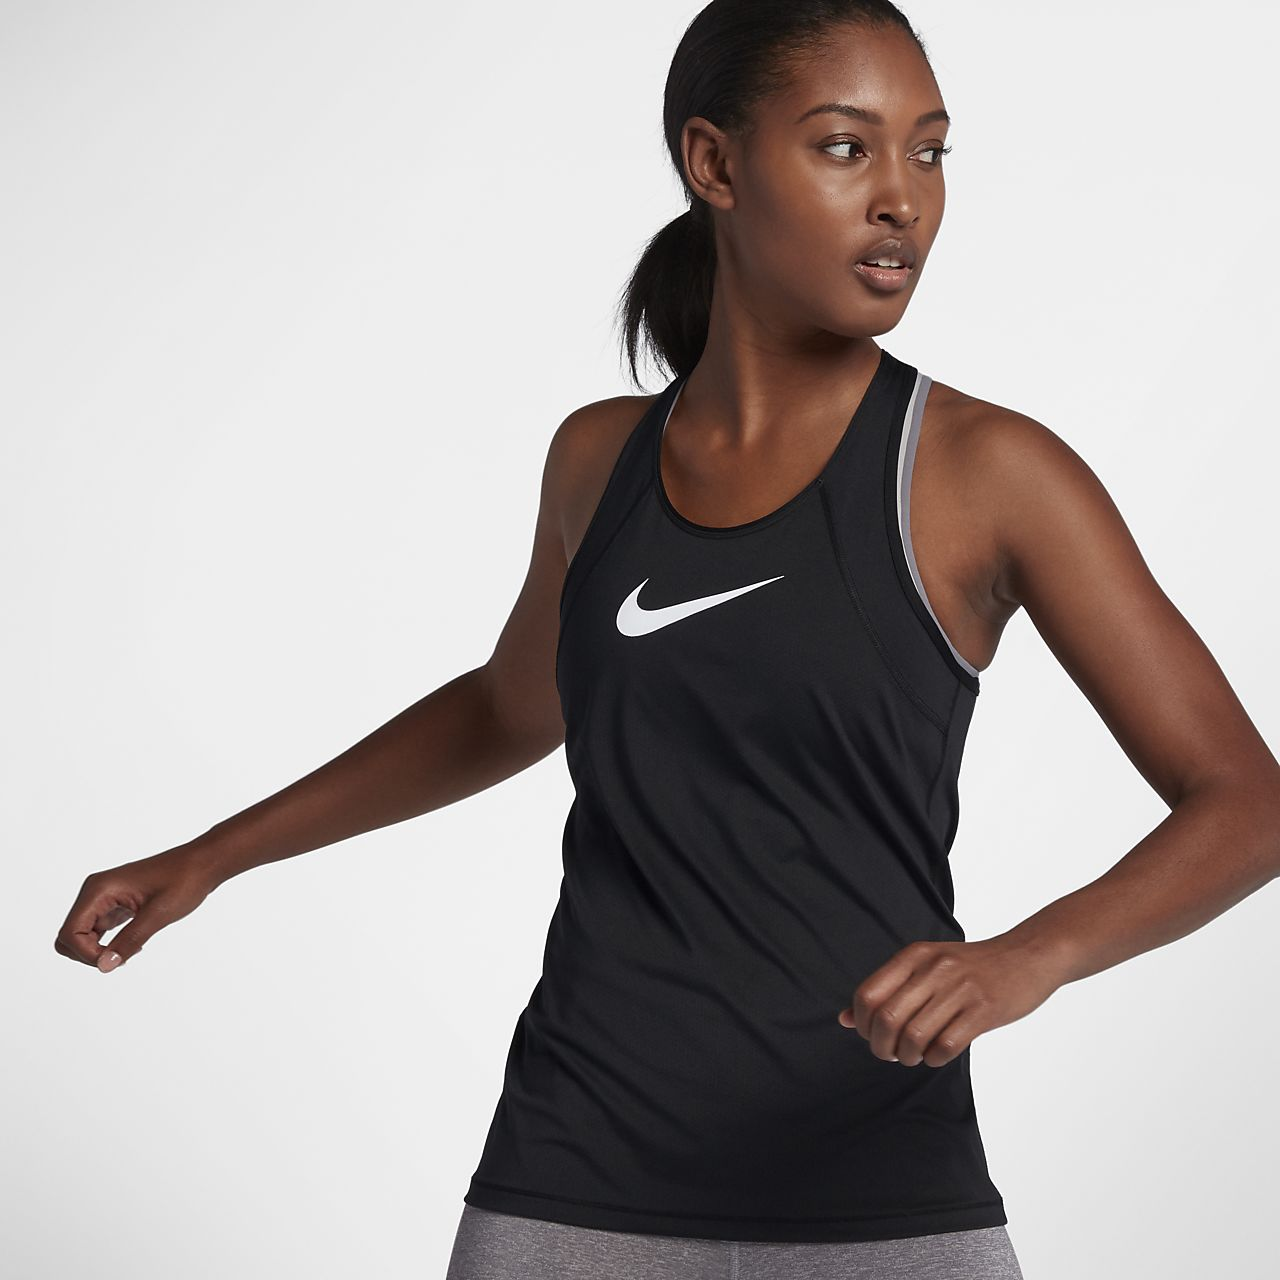 bf5d2323ee0501 Nike Pro Women s Training Tank. Nike.com AU